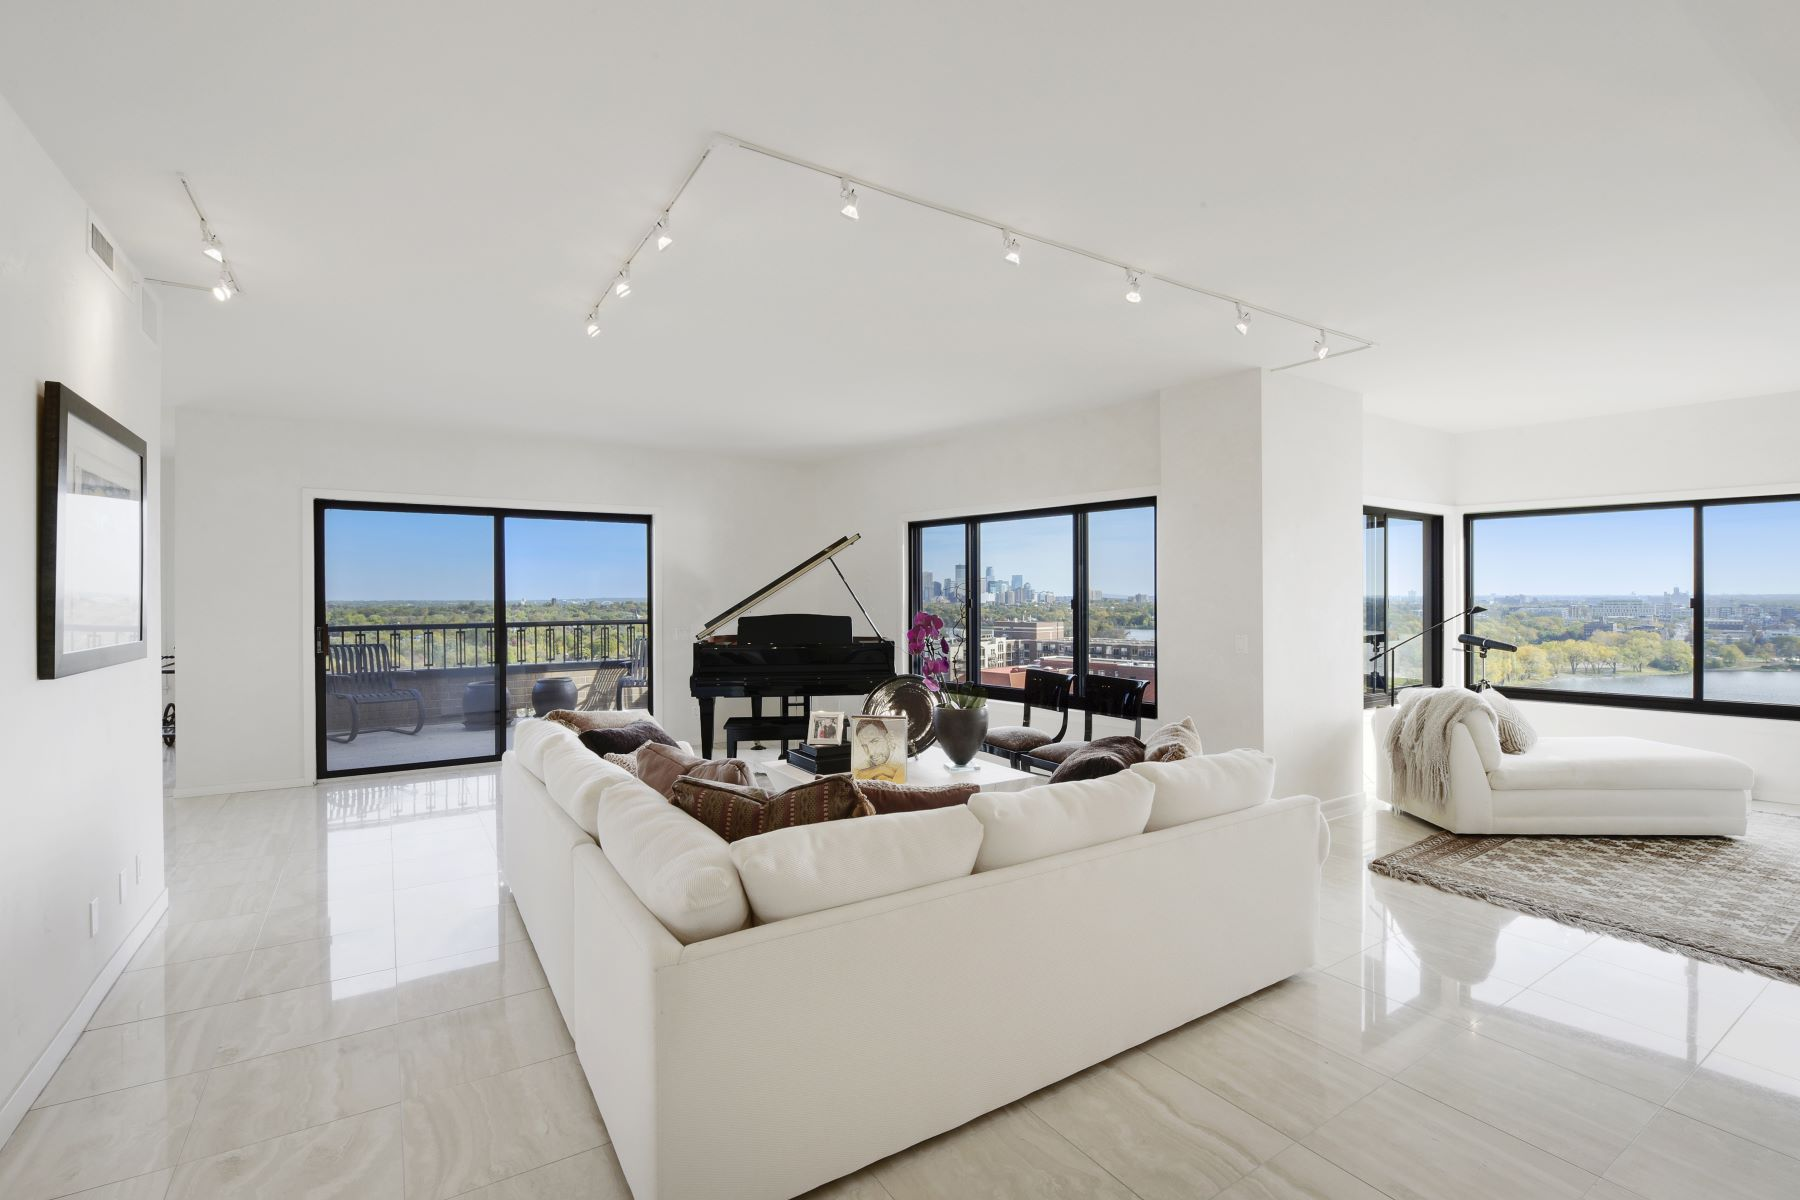 Condominiums 为 销售 在 2950 Dean Parkway #1903 明尼阿波利斯市, 明尼苏达州 55416 美国